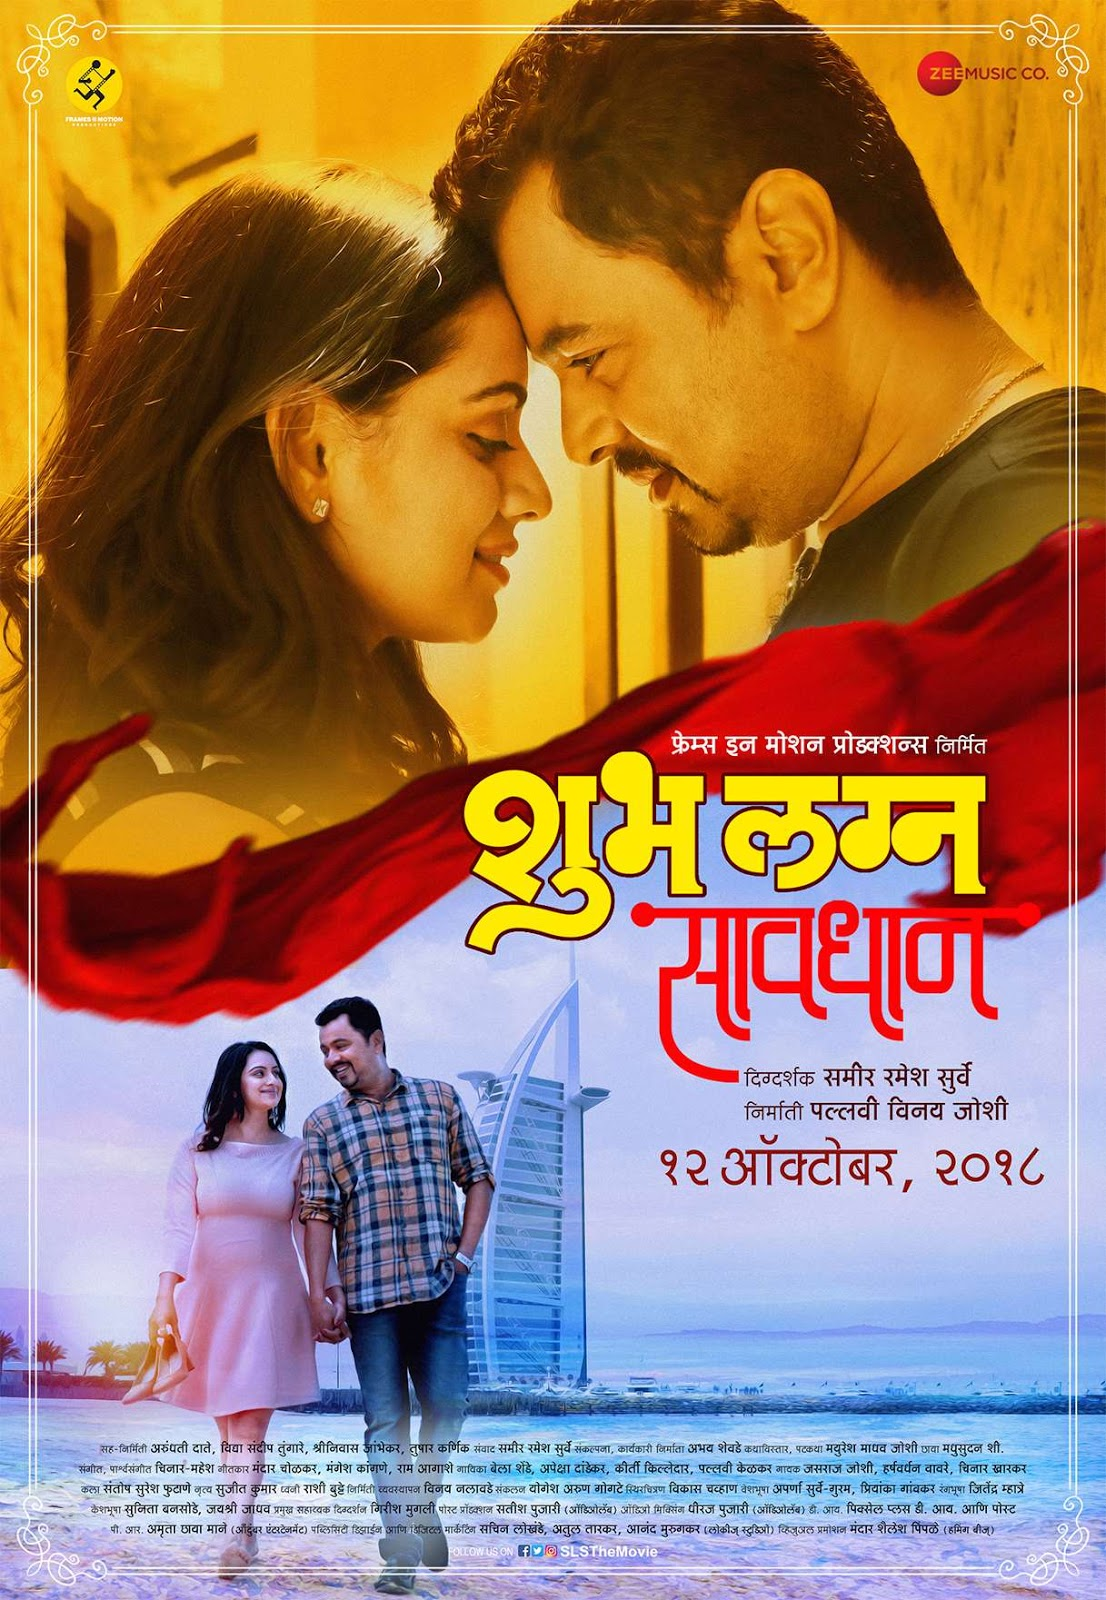 शुभ लग्न सावधान मराठी चित्रपटाचे पोस्टर - मराठी चित्रपट | Shubh Lagna Savdhan Marathi Movie Poster - Marathi Movie